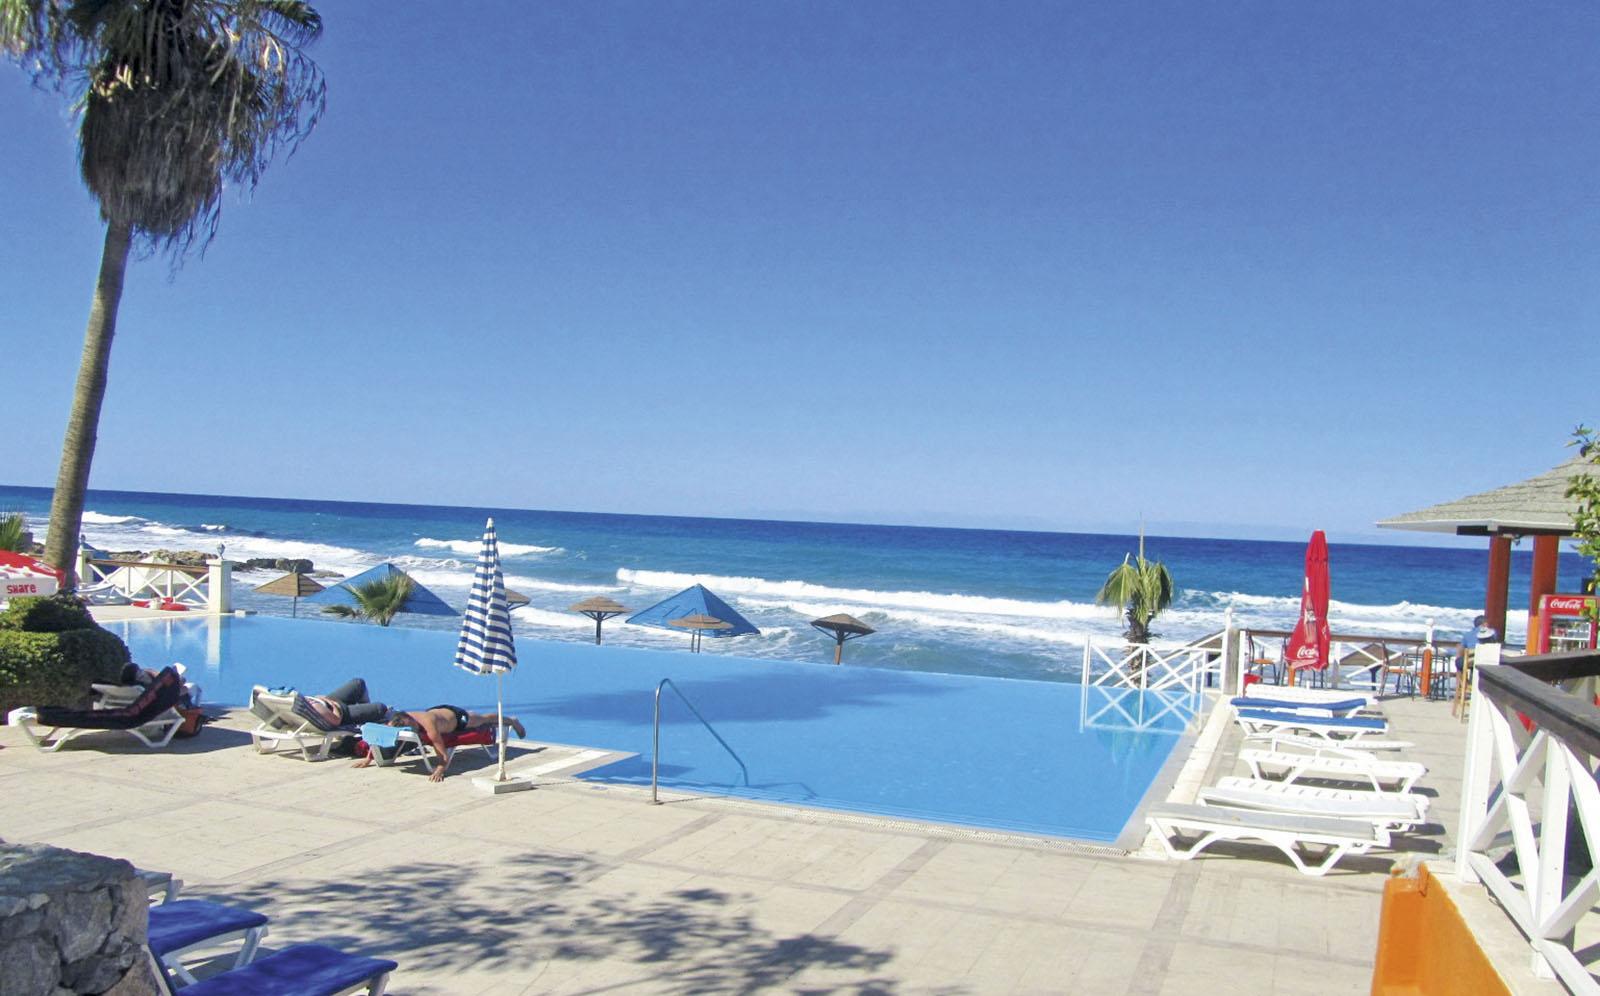 http://www.budavartours.hu/binaries//content/gallery/budavar/locations/accomodations/Ciprus/Kyrenia/L.A.+Beach+Resort/la_beach_resort_kyrenia_medence.jpg